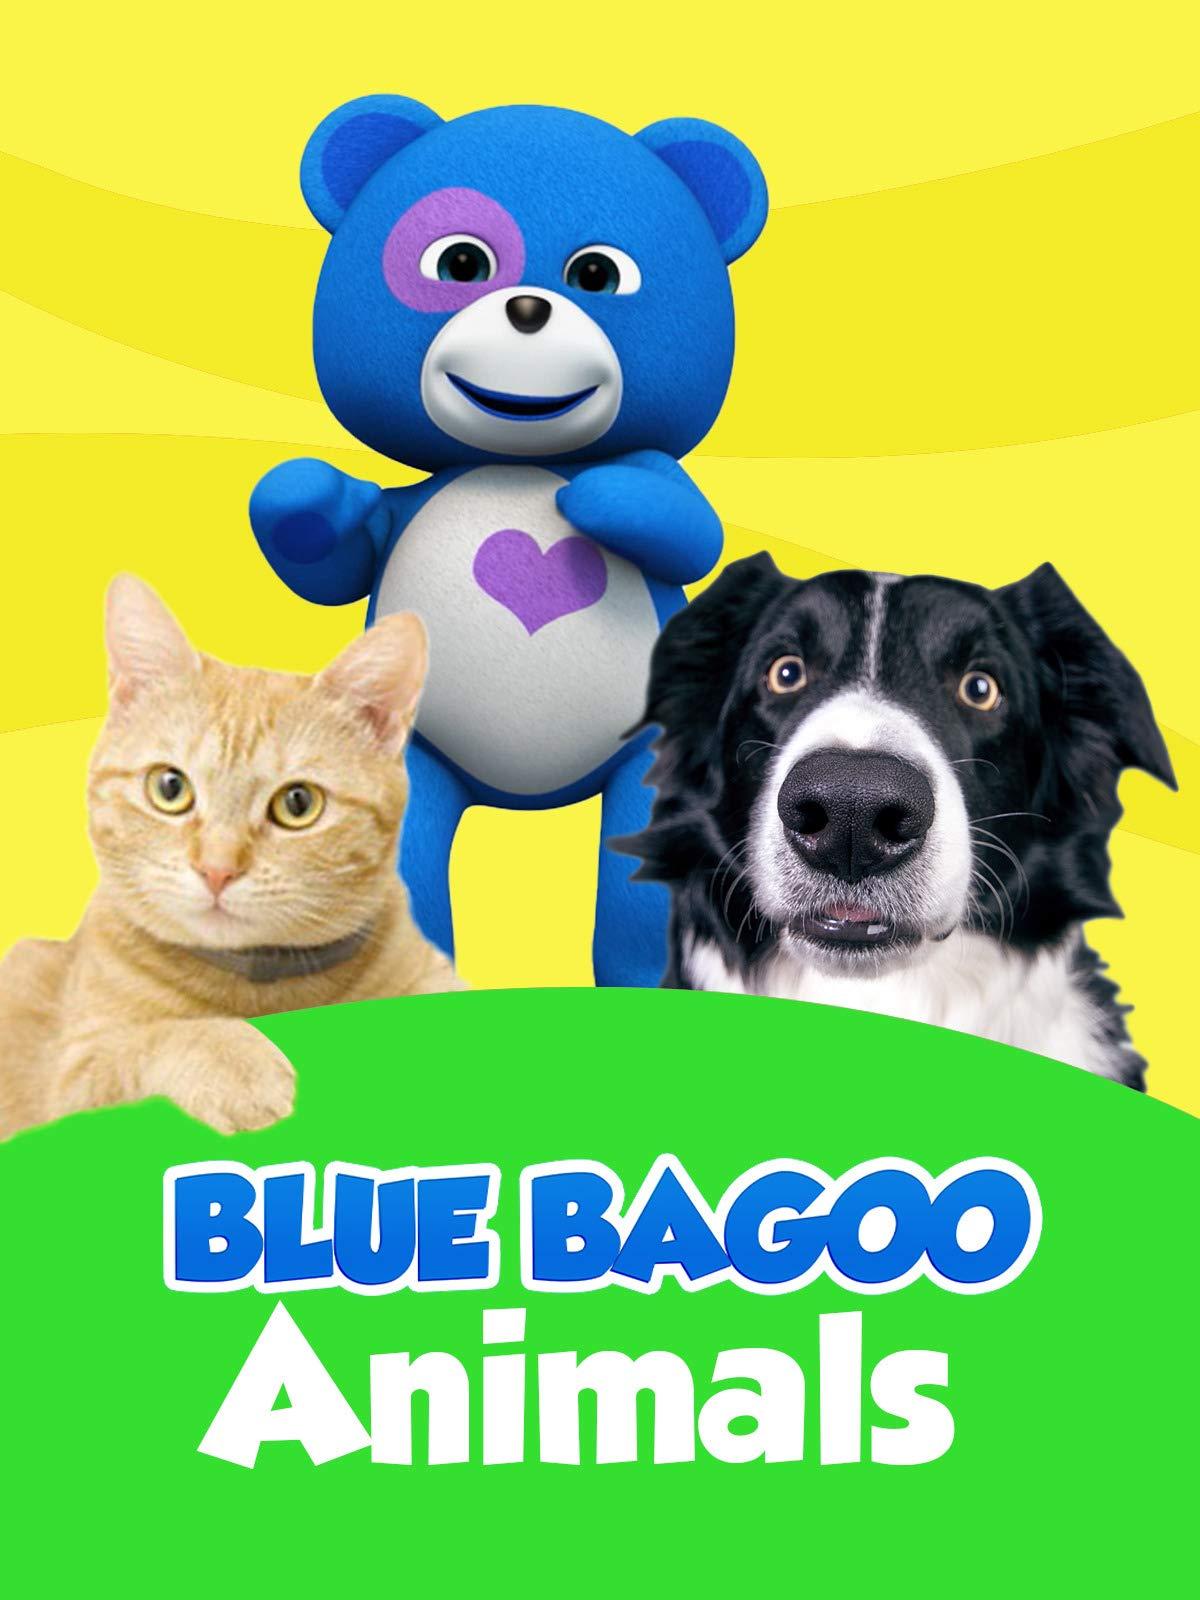 Blue Bagoo Animals